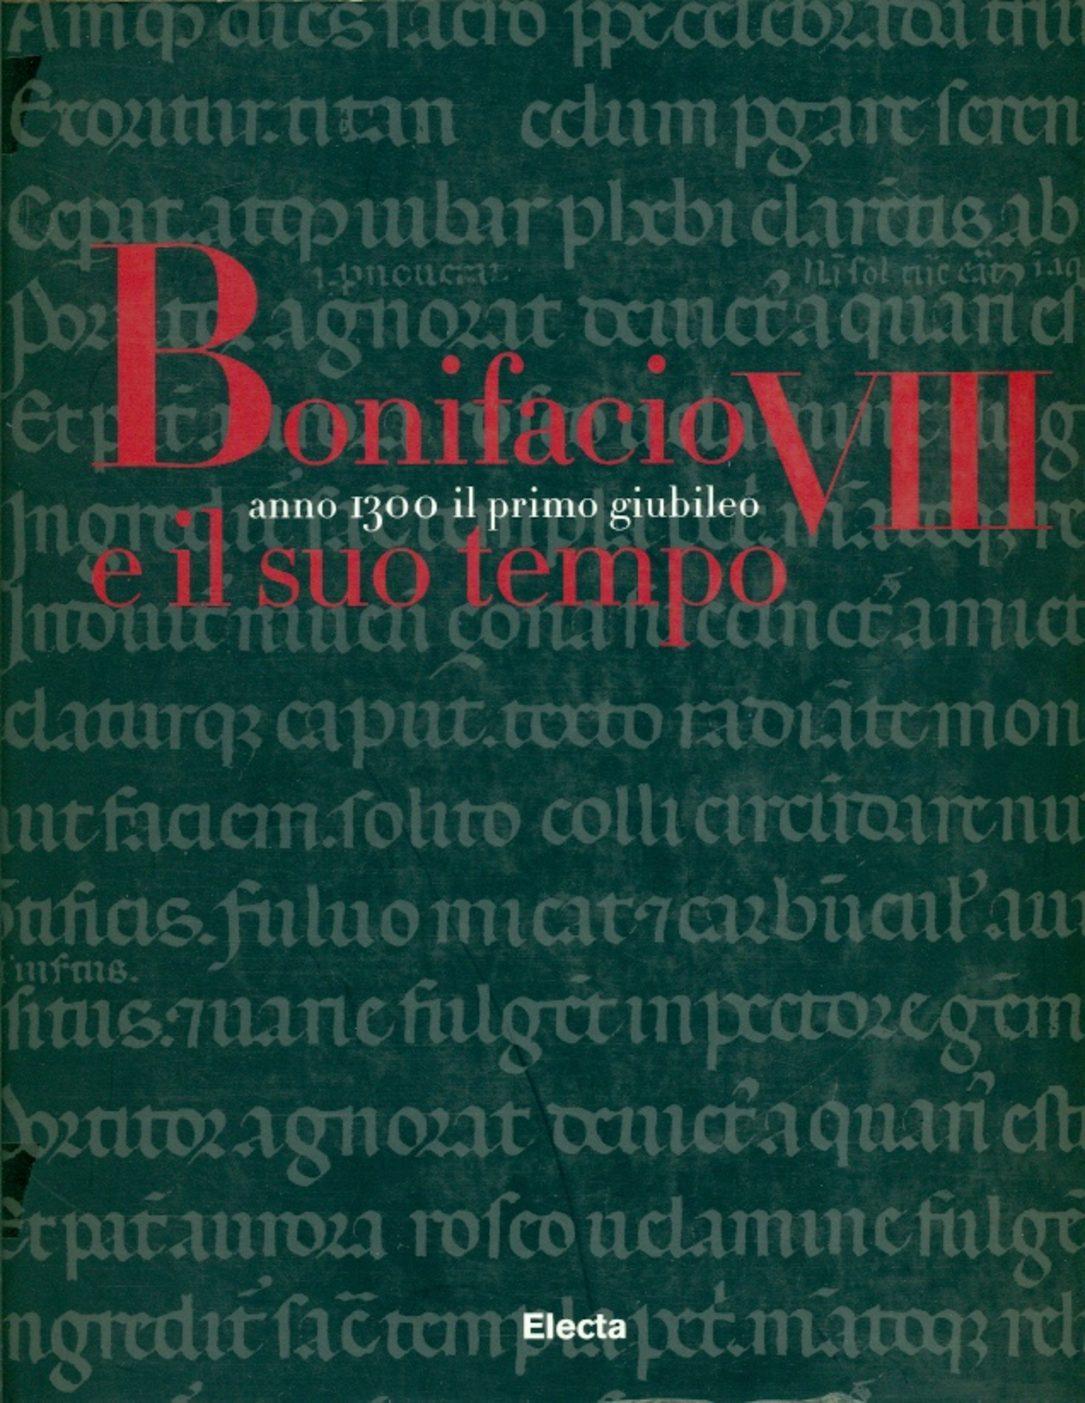 http://cbccoop.it/app/uploads/2017/06/COP-Bonifacio-VIII-pdf.jpg